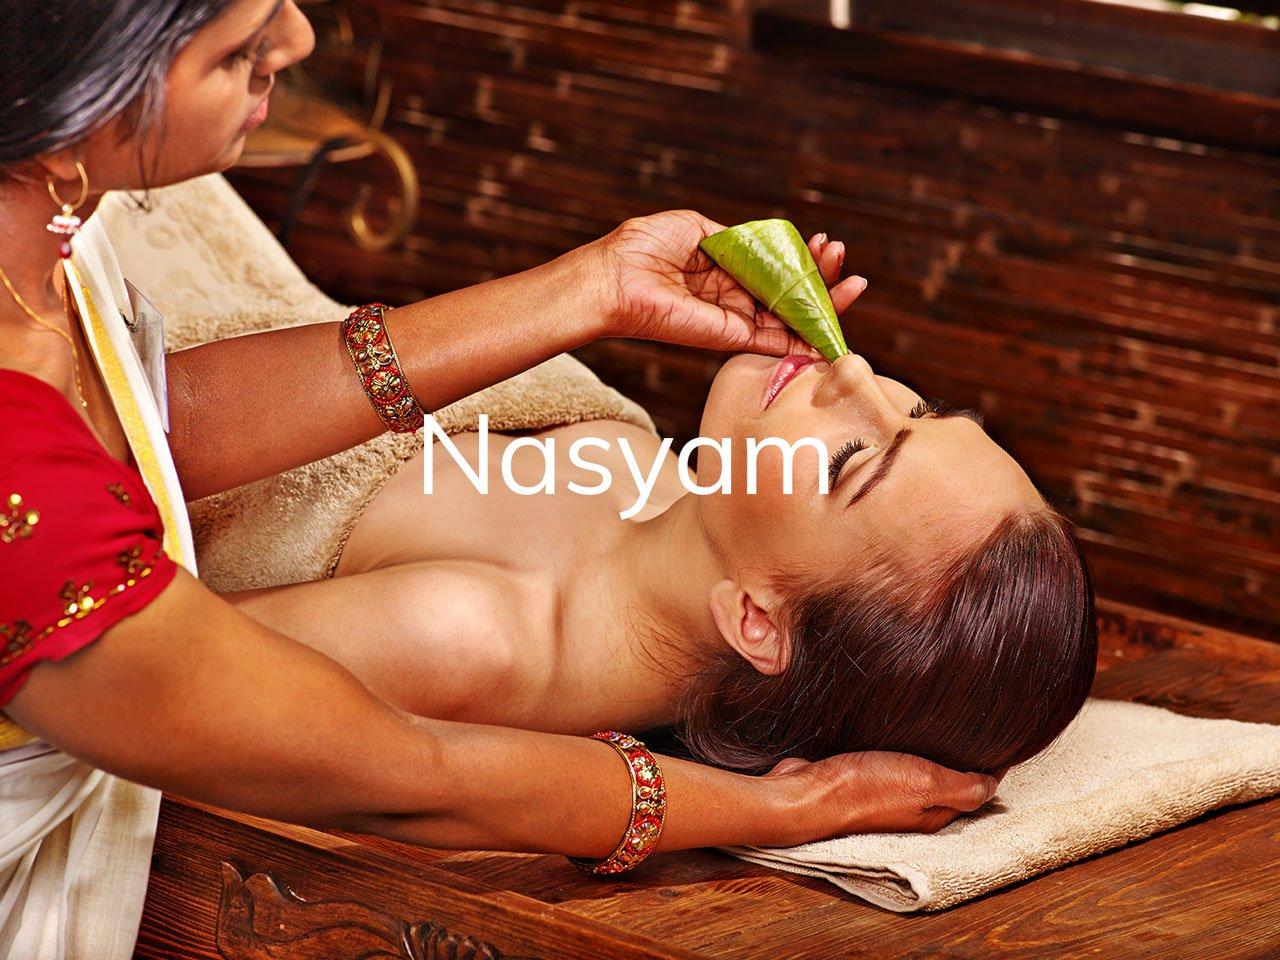 Nasyam - Centre ayurvedique Beaune